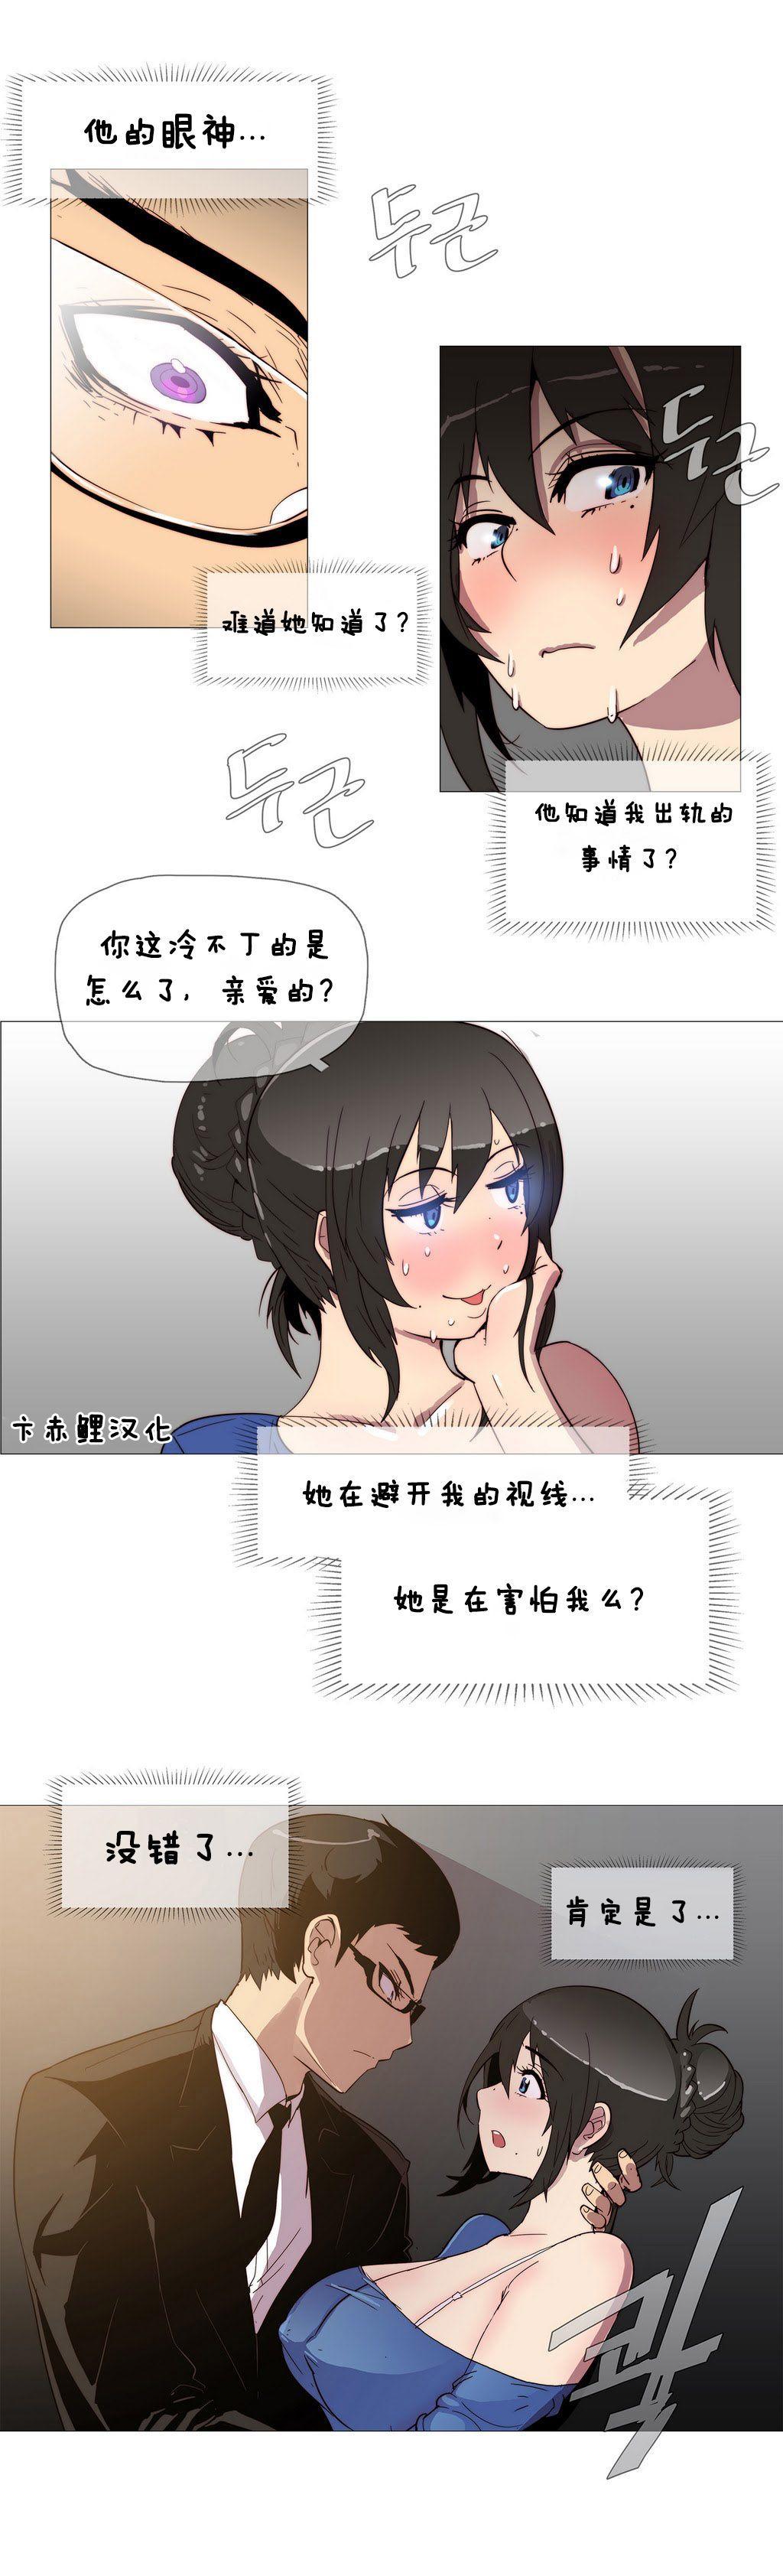 HouseHold Affairs 【卞赤鲤个人汉化】1~33话(持续更新中) 50